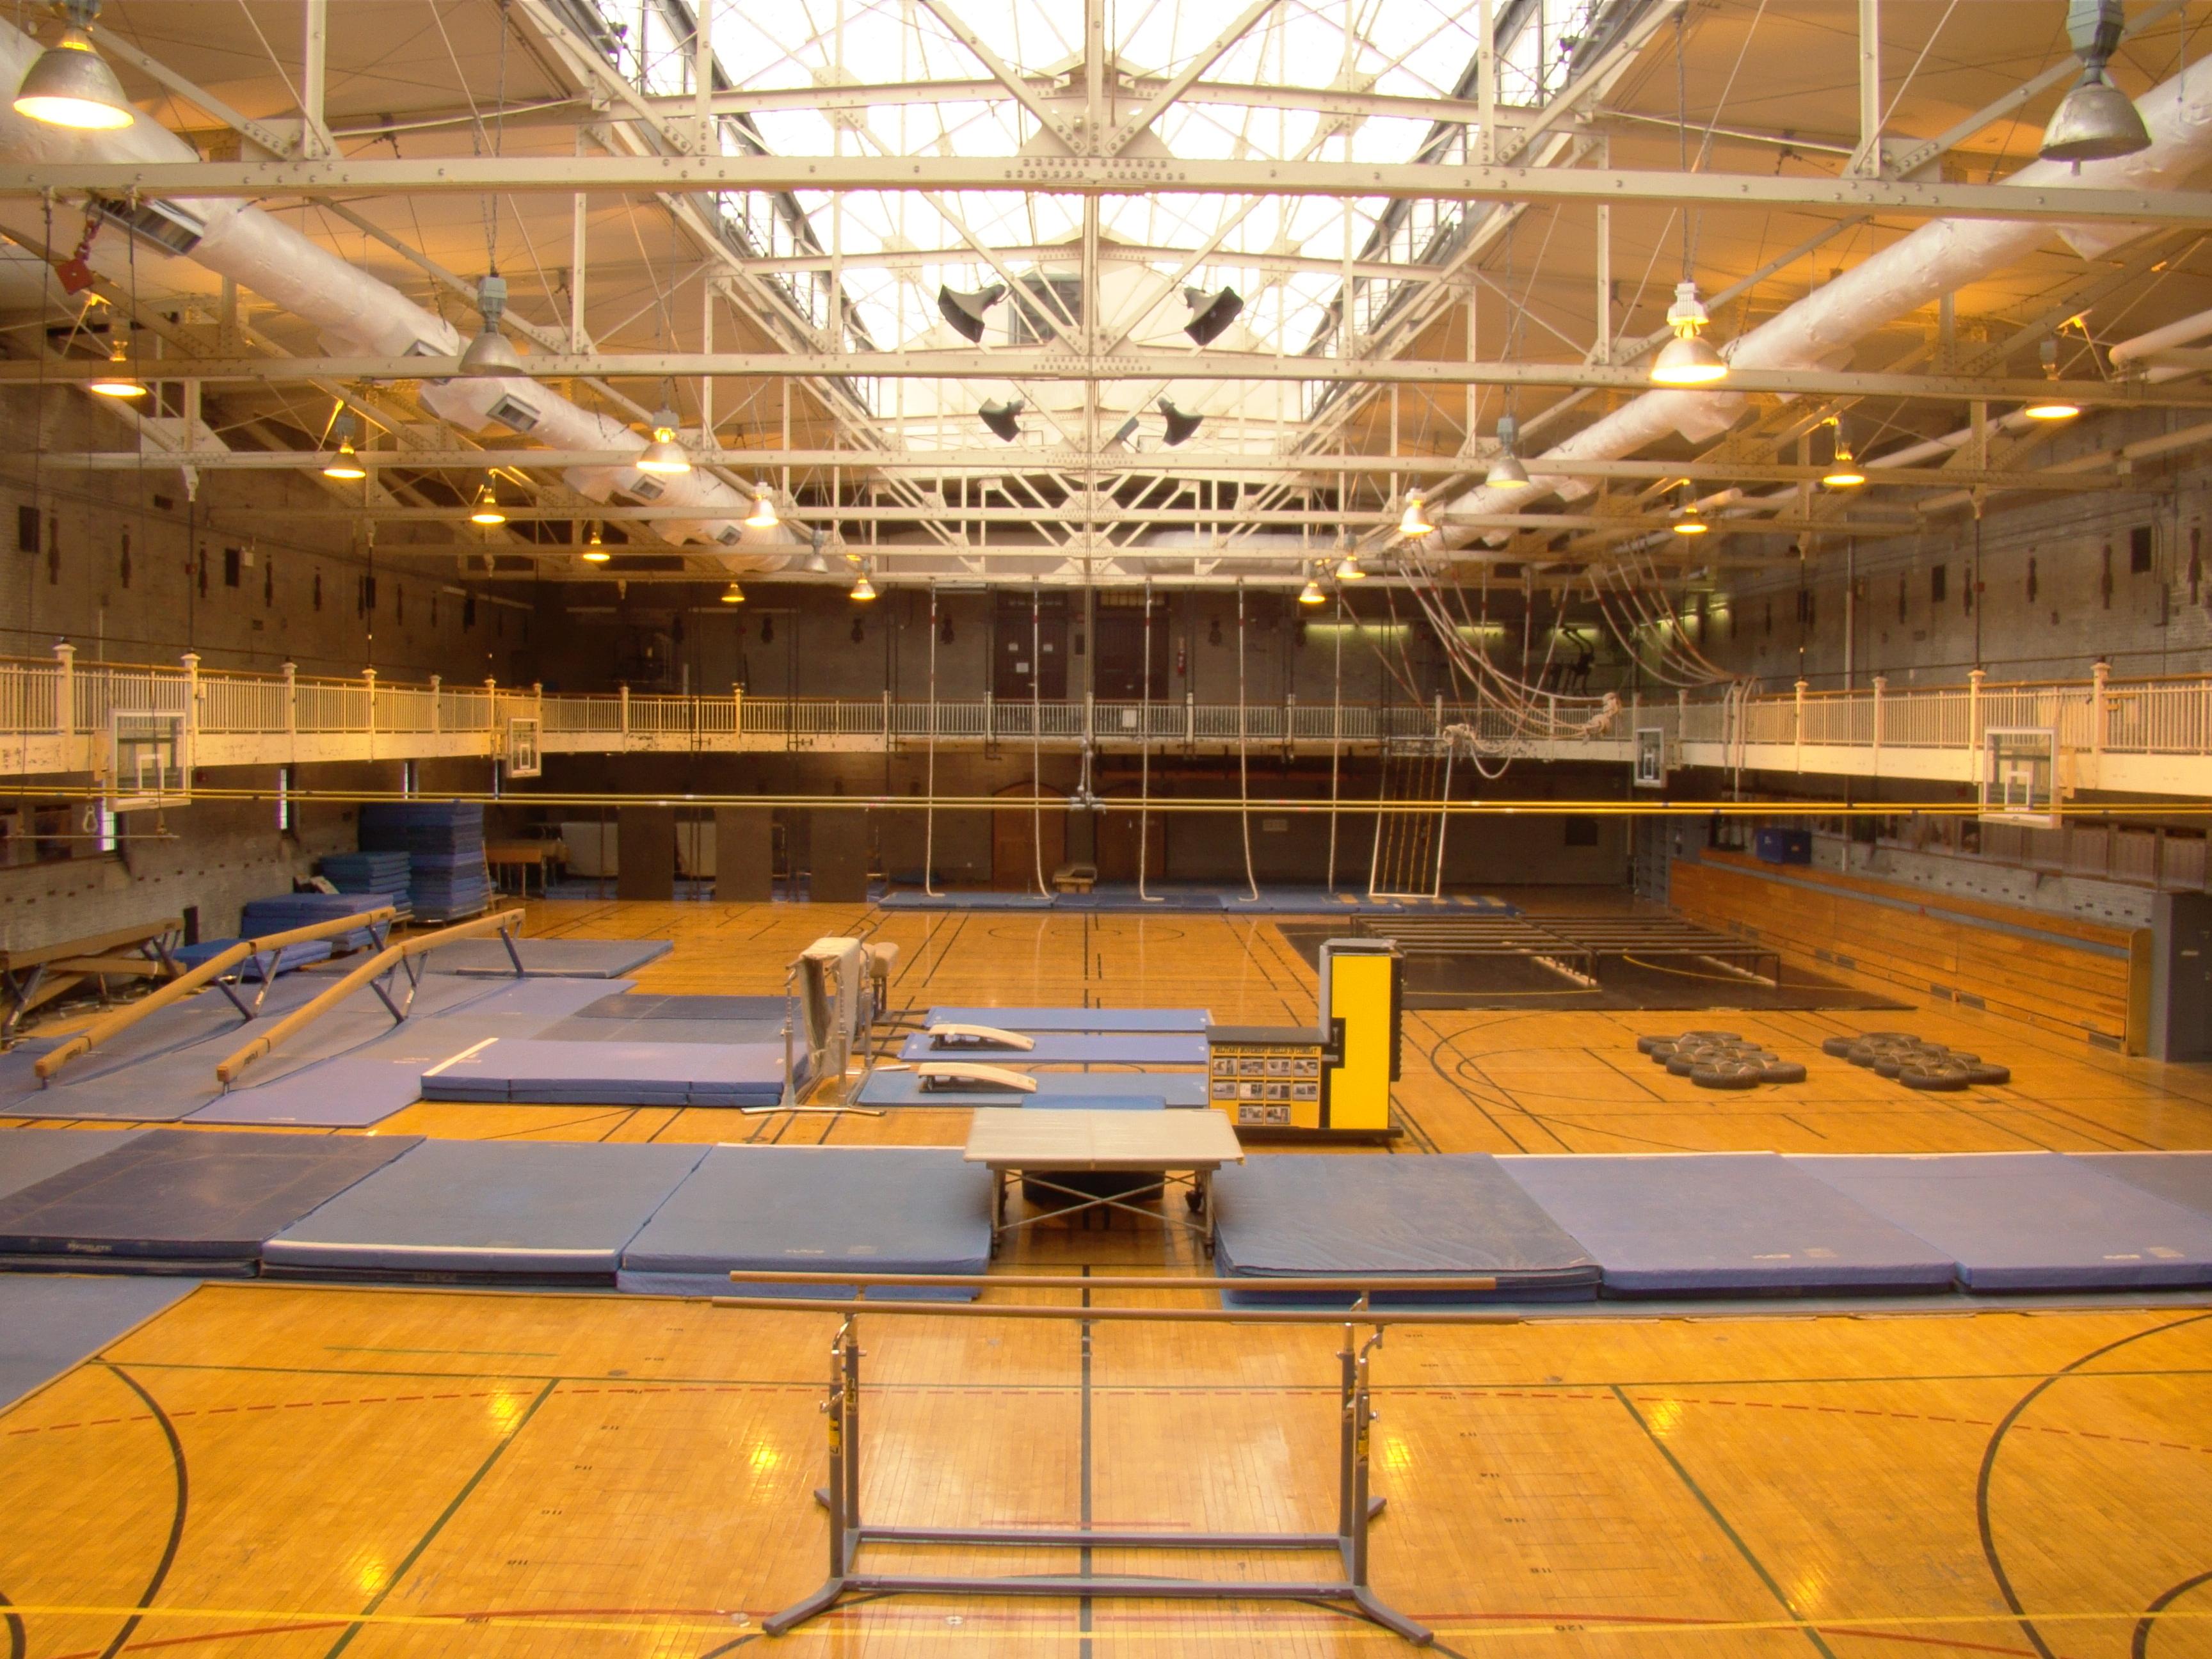 File:Hayes Gym Main Room, 2009.JPG - Wikimedia Commons